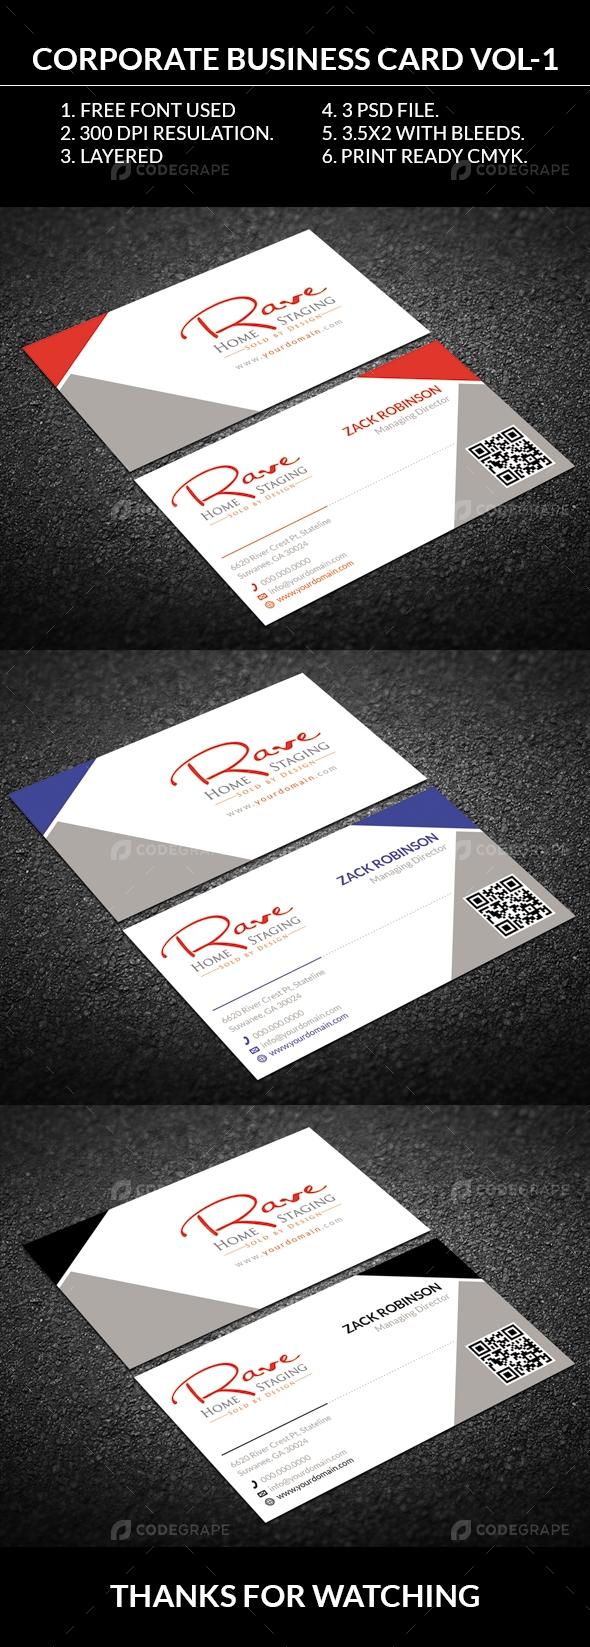 Corporate Business Card Vol-2